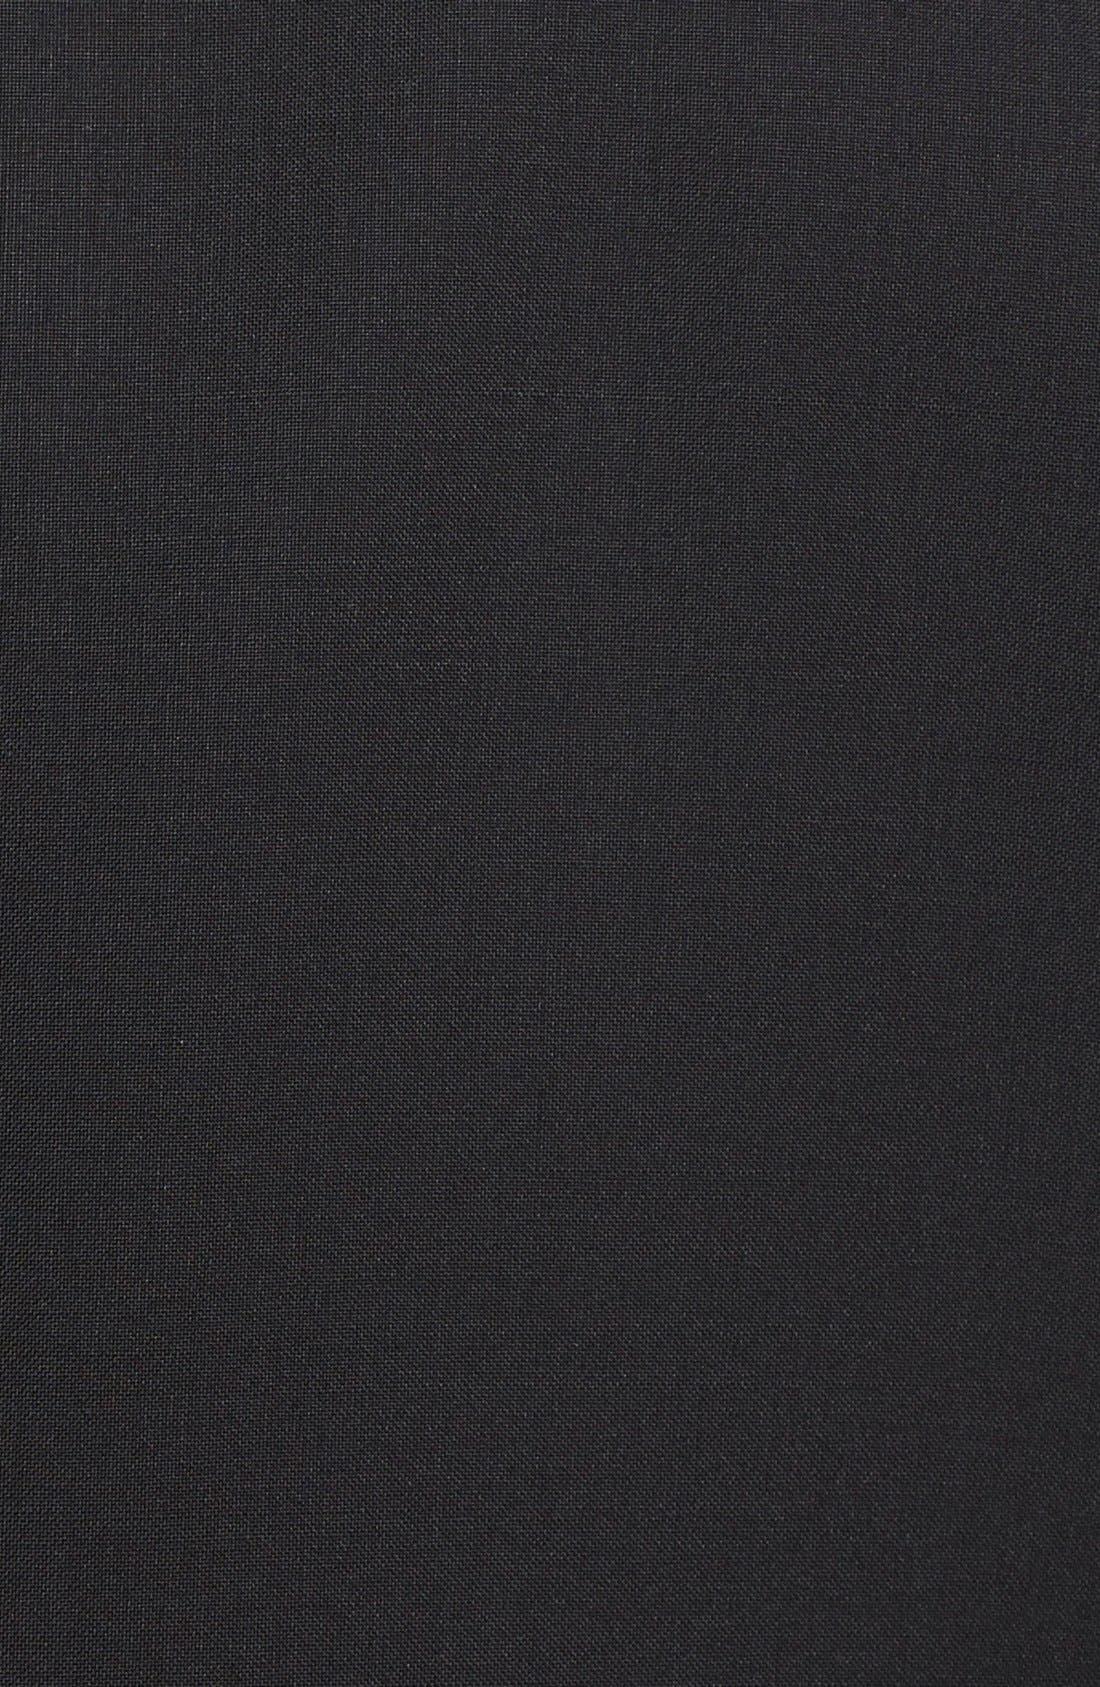 13000 Classic Fit Wool & Mohair Tuxedo,                             Alternate thumbnail 6, color,                             BLACK